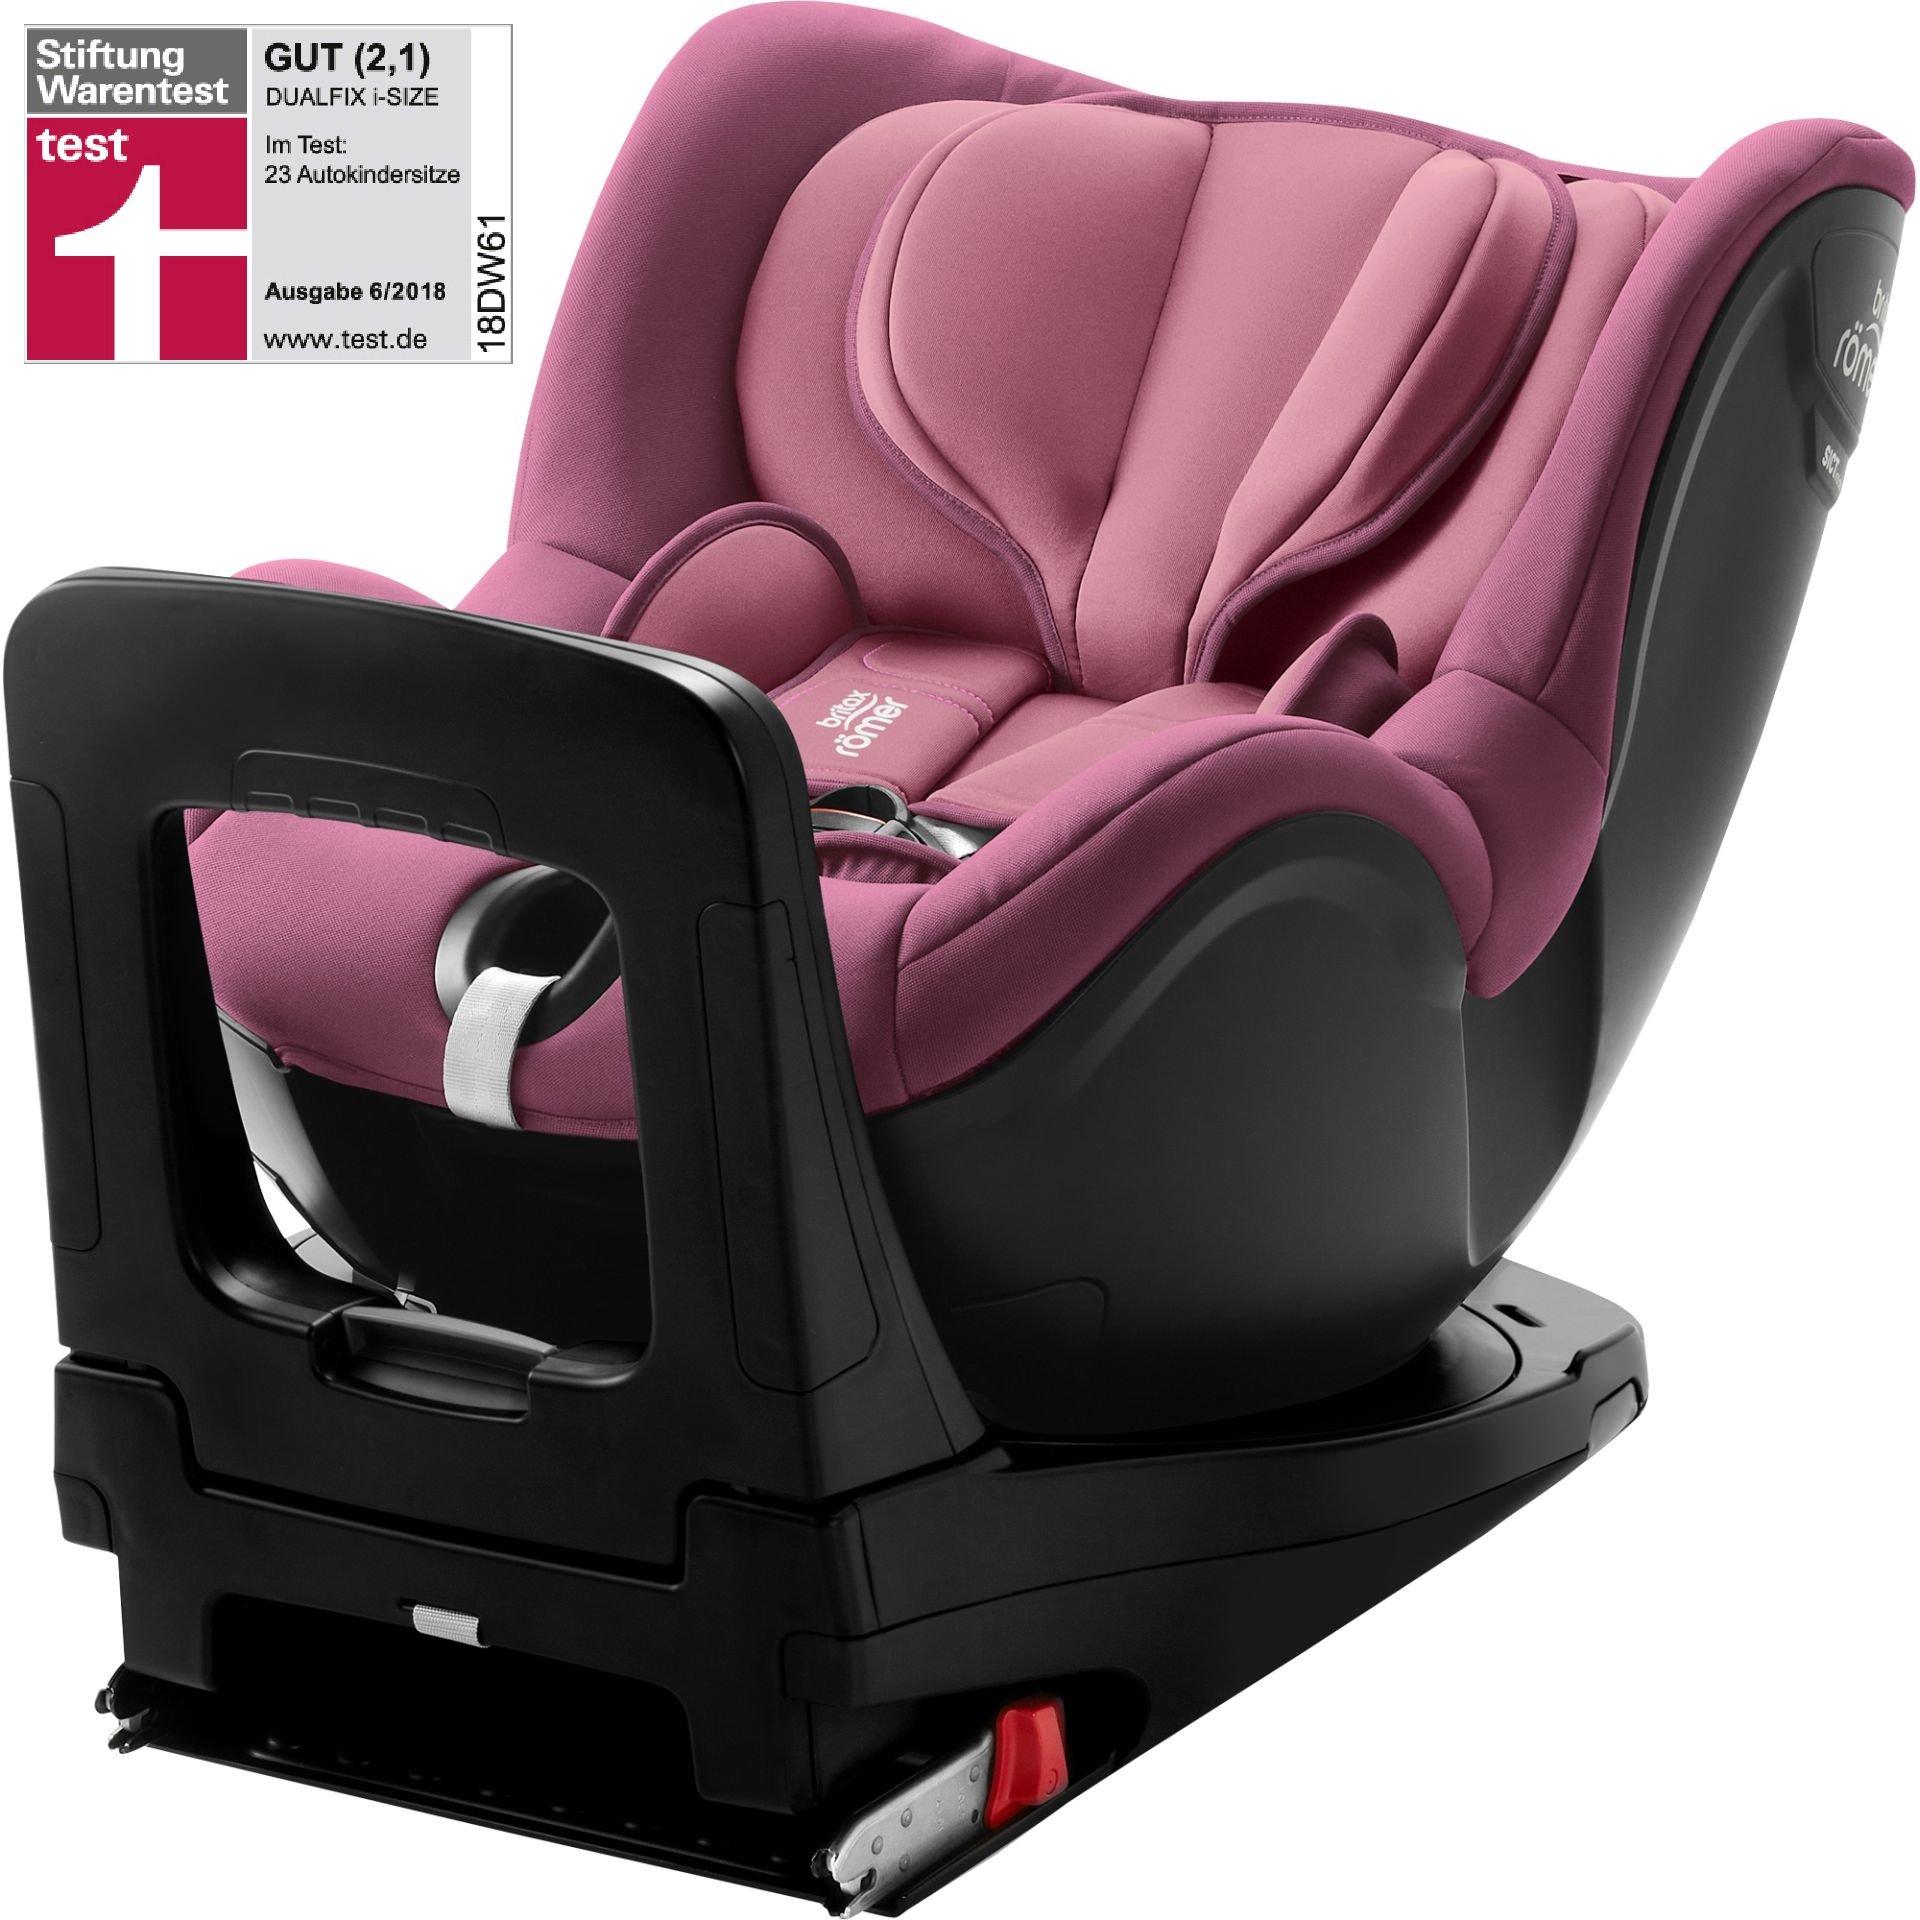 britax r mer child car seat dualfix i size 2018 wine rose buy at kidsroom car seats. Black Bedroom Furniture Sets. Home Design Ideas